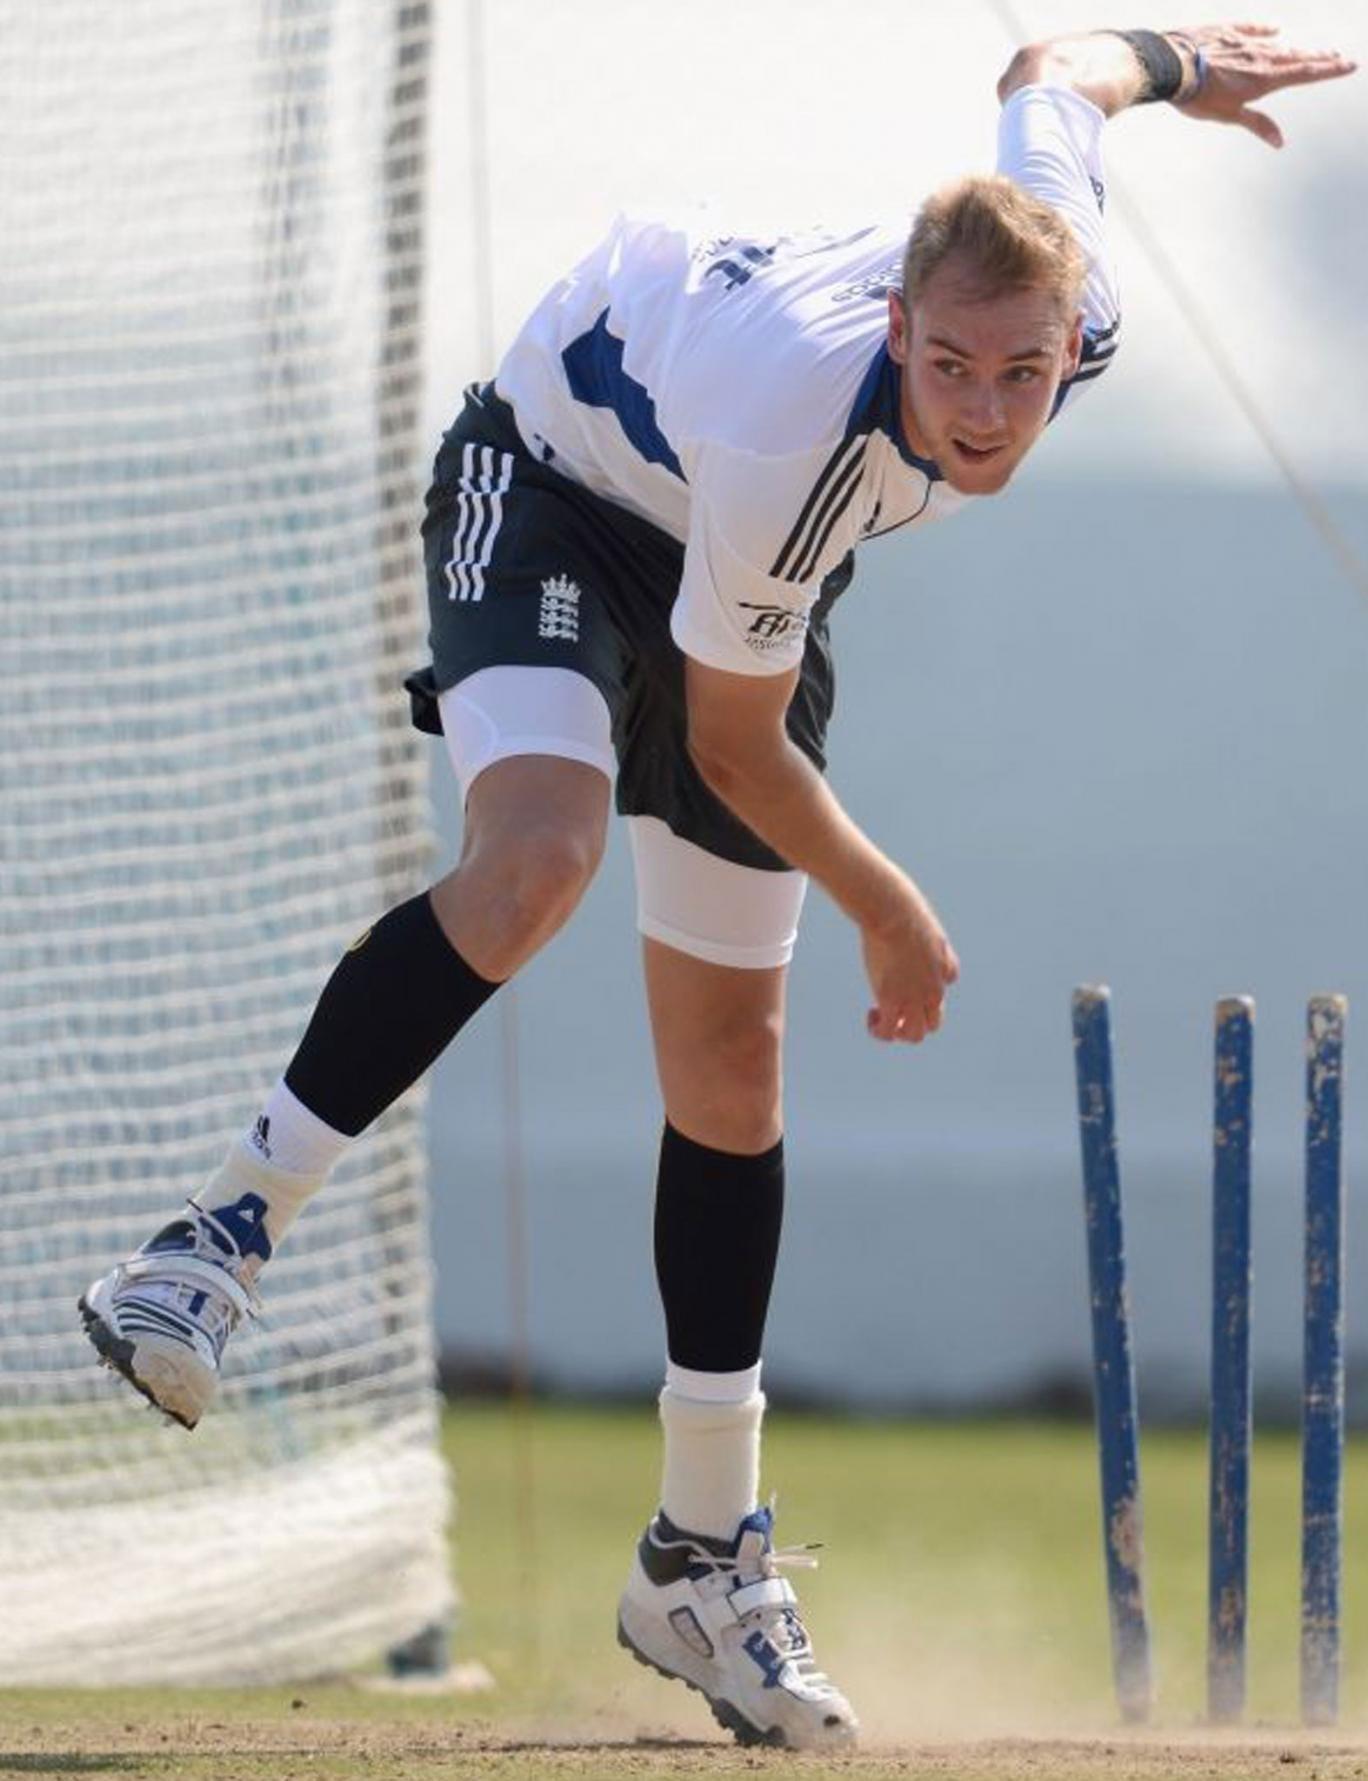 England cricketer, Stuart Broad